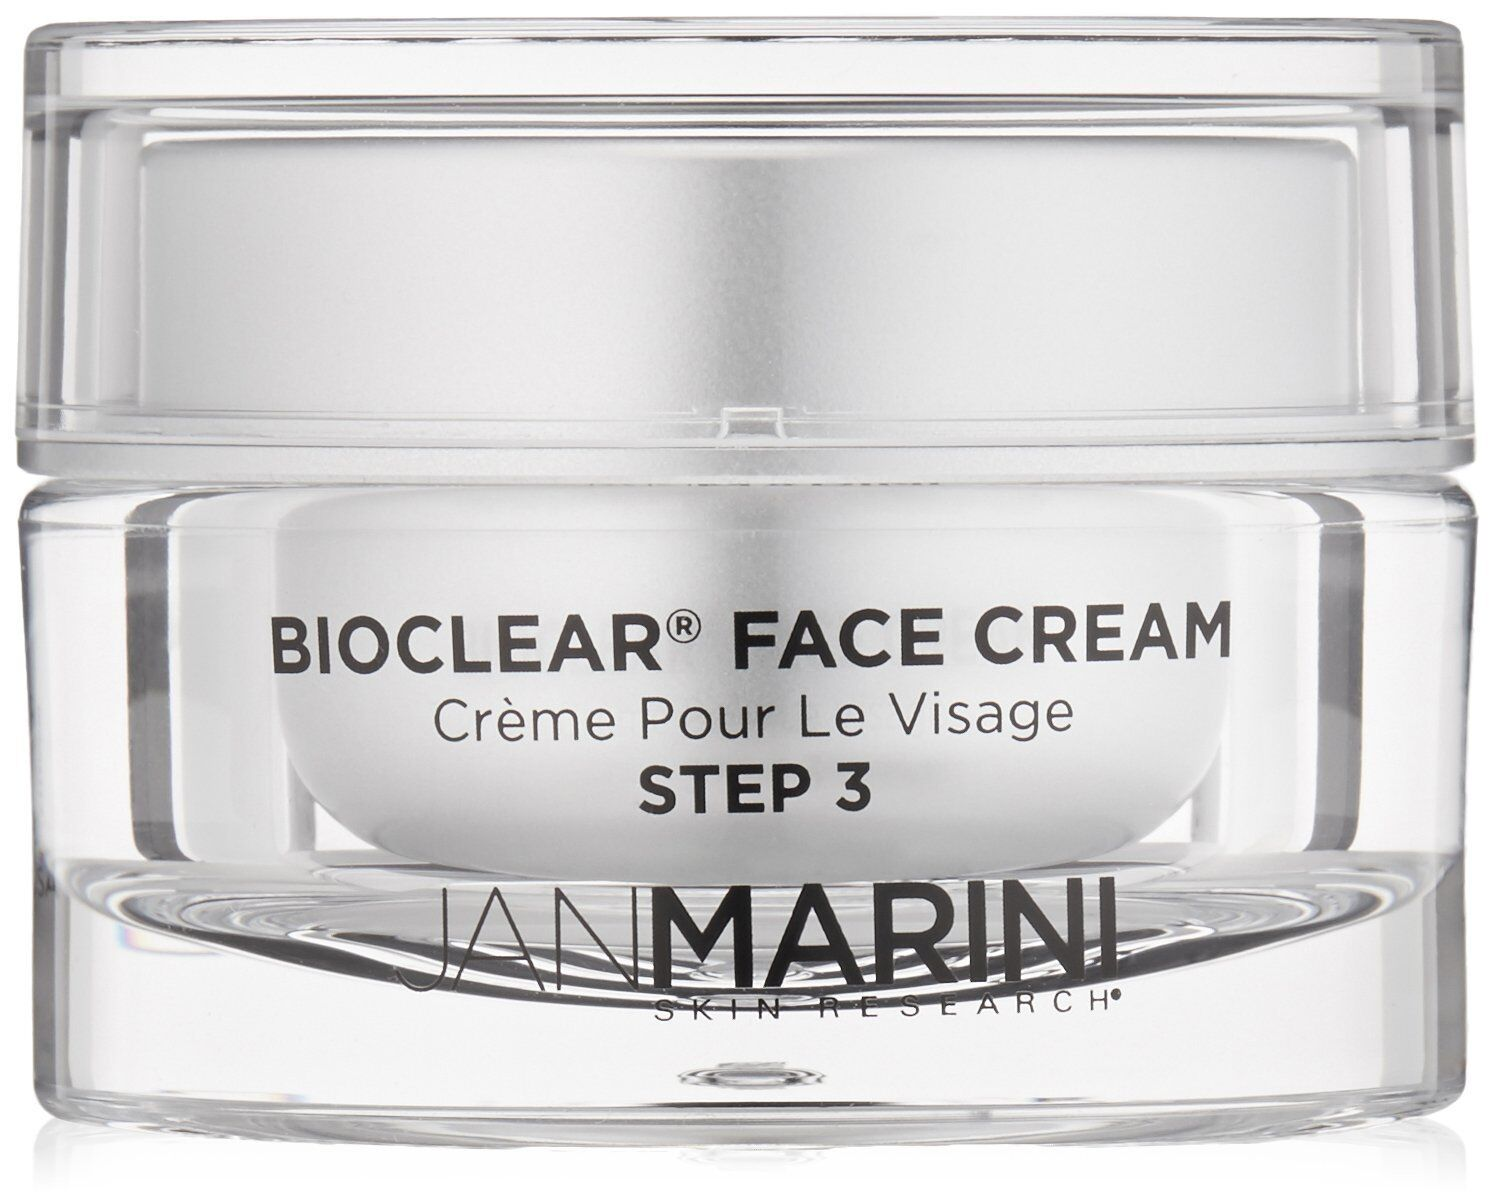 Jan Marini Bioclear Face Cream 1 oz